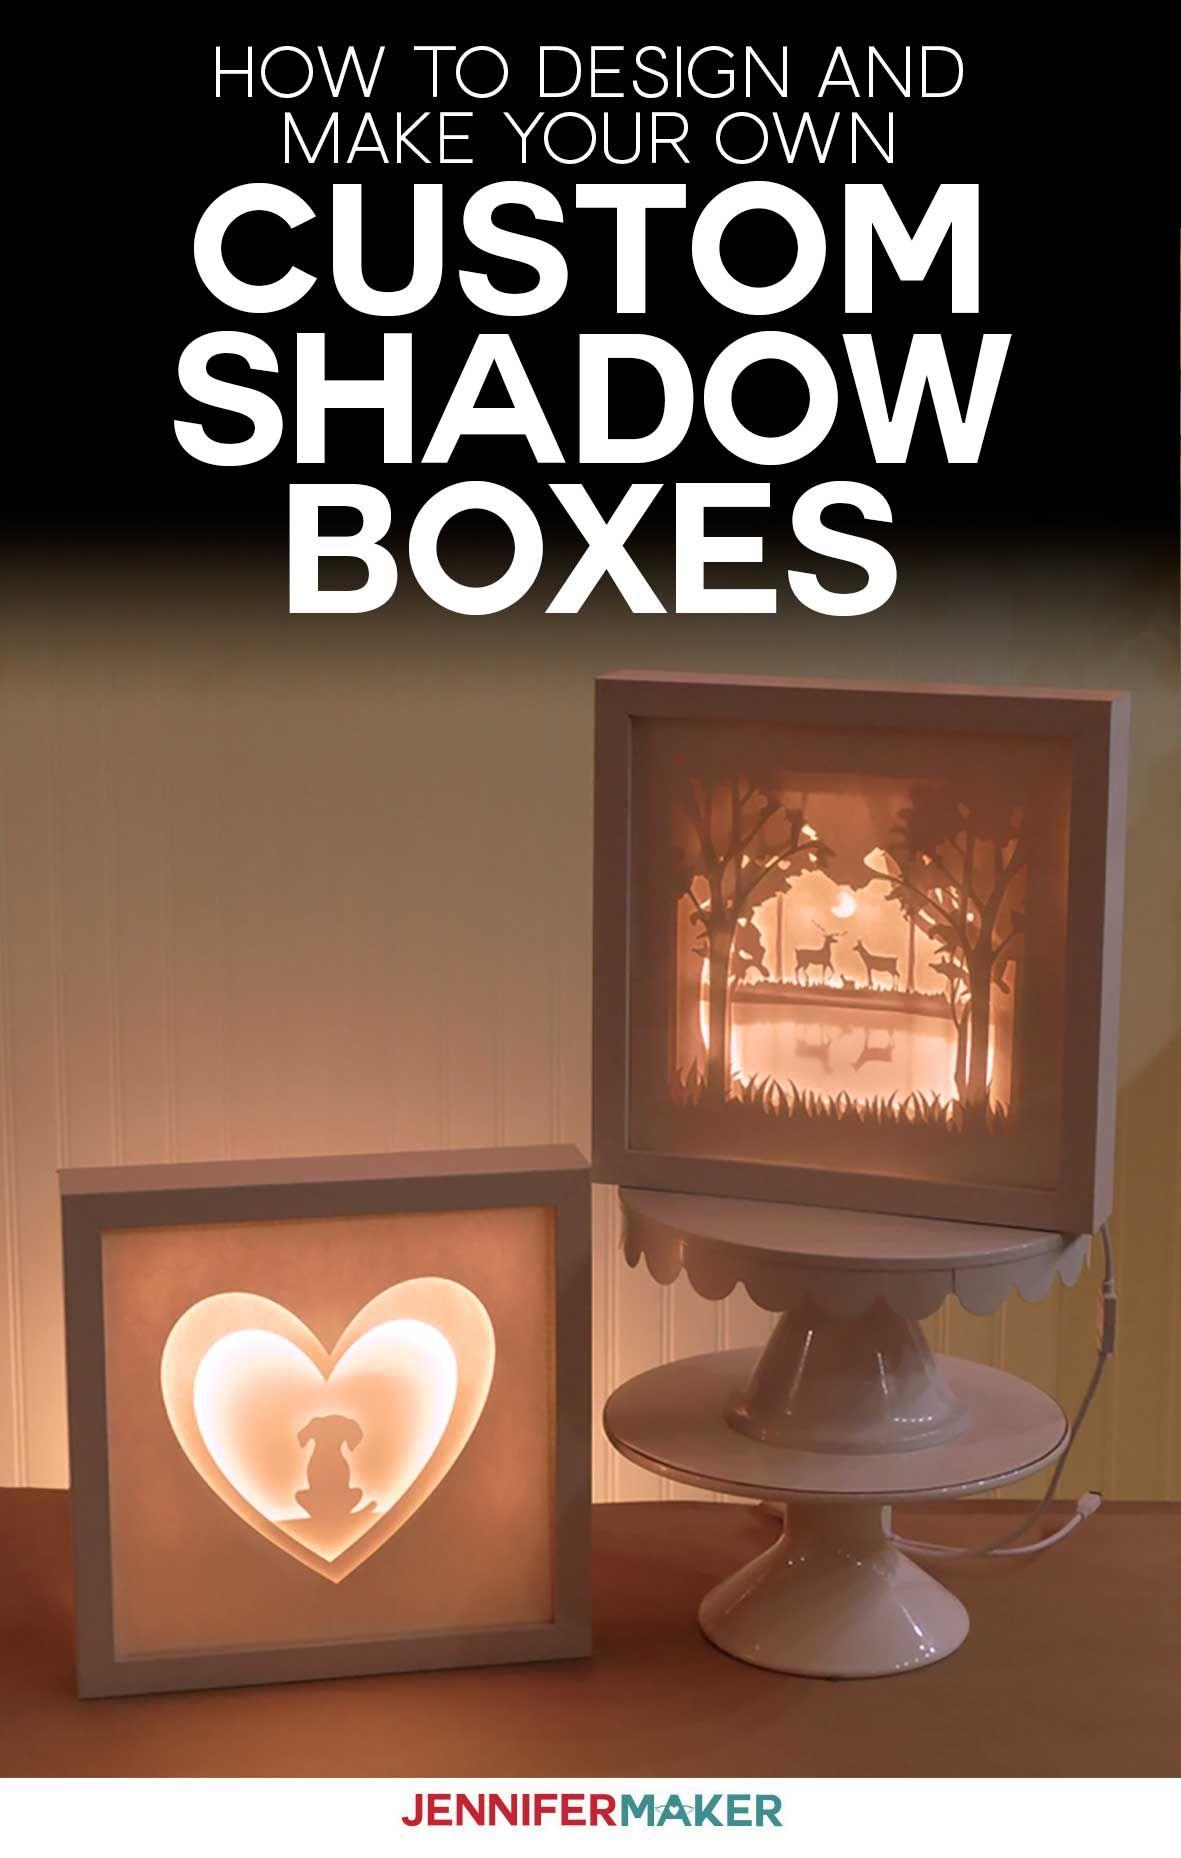 Custom Shadow Box Make Your Own in Cricut Design Space